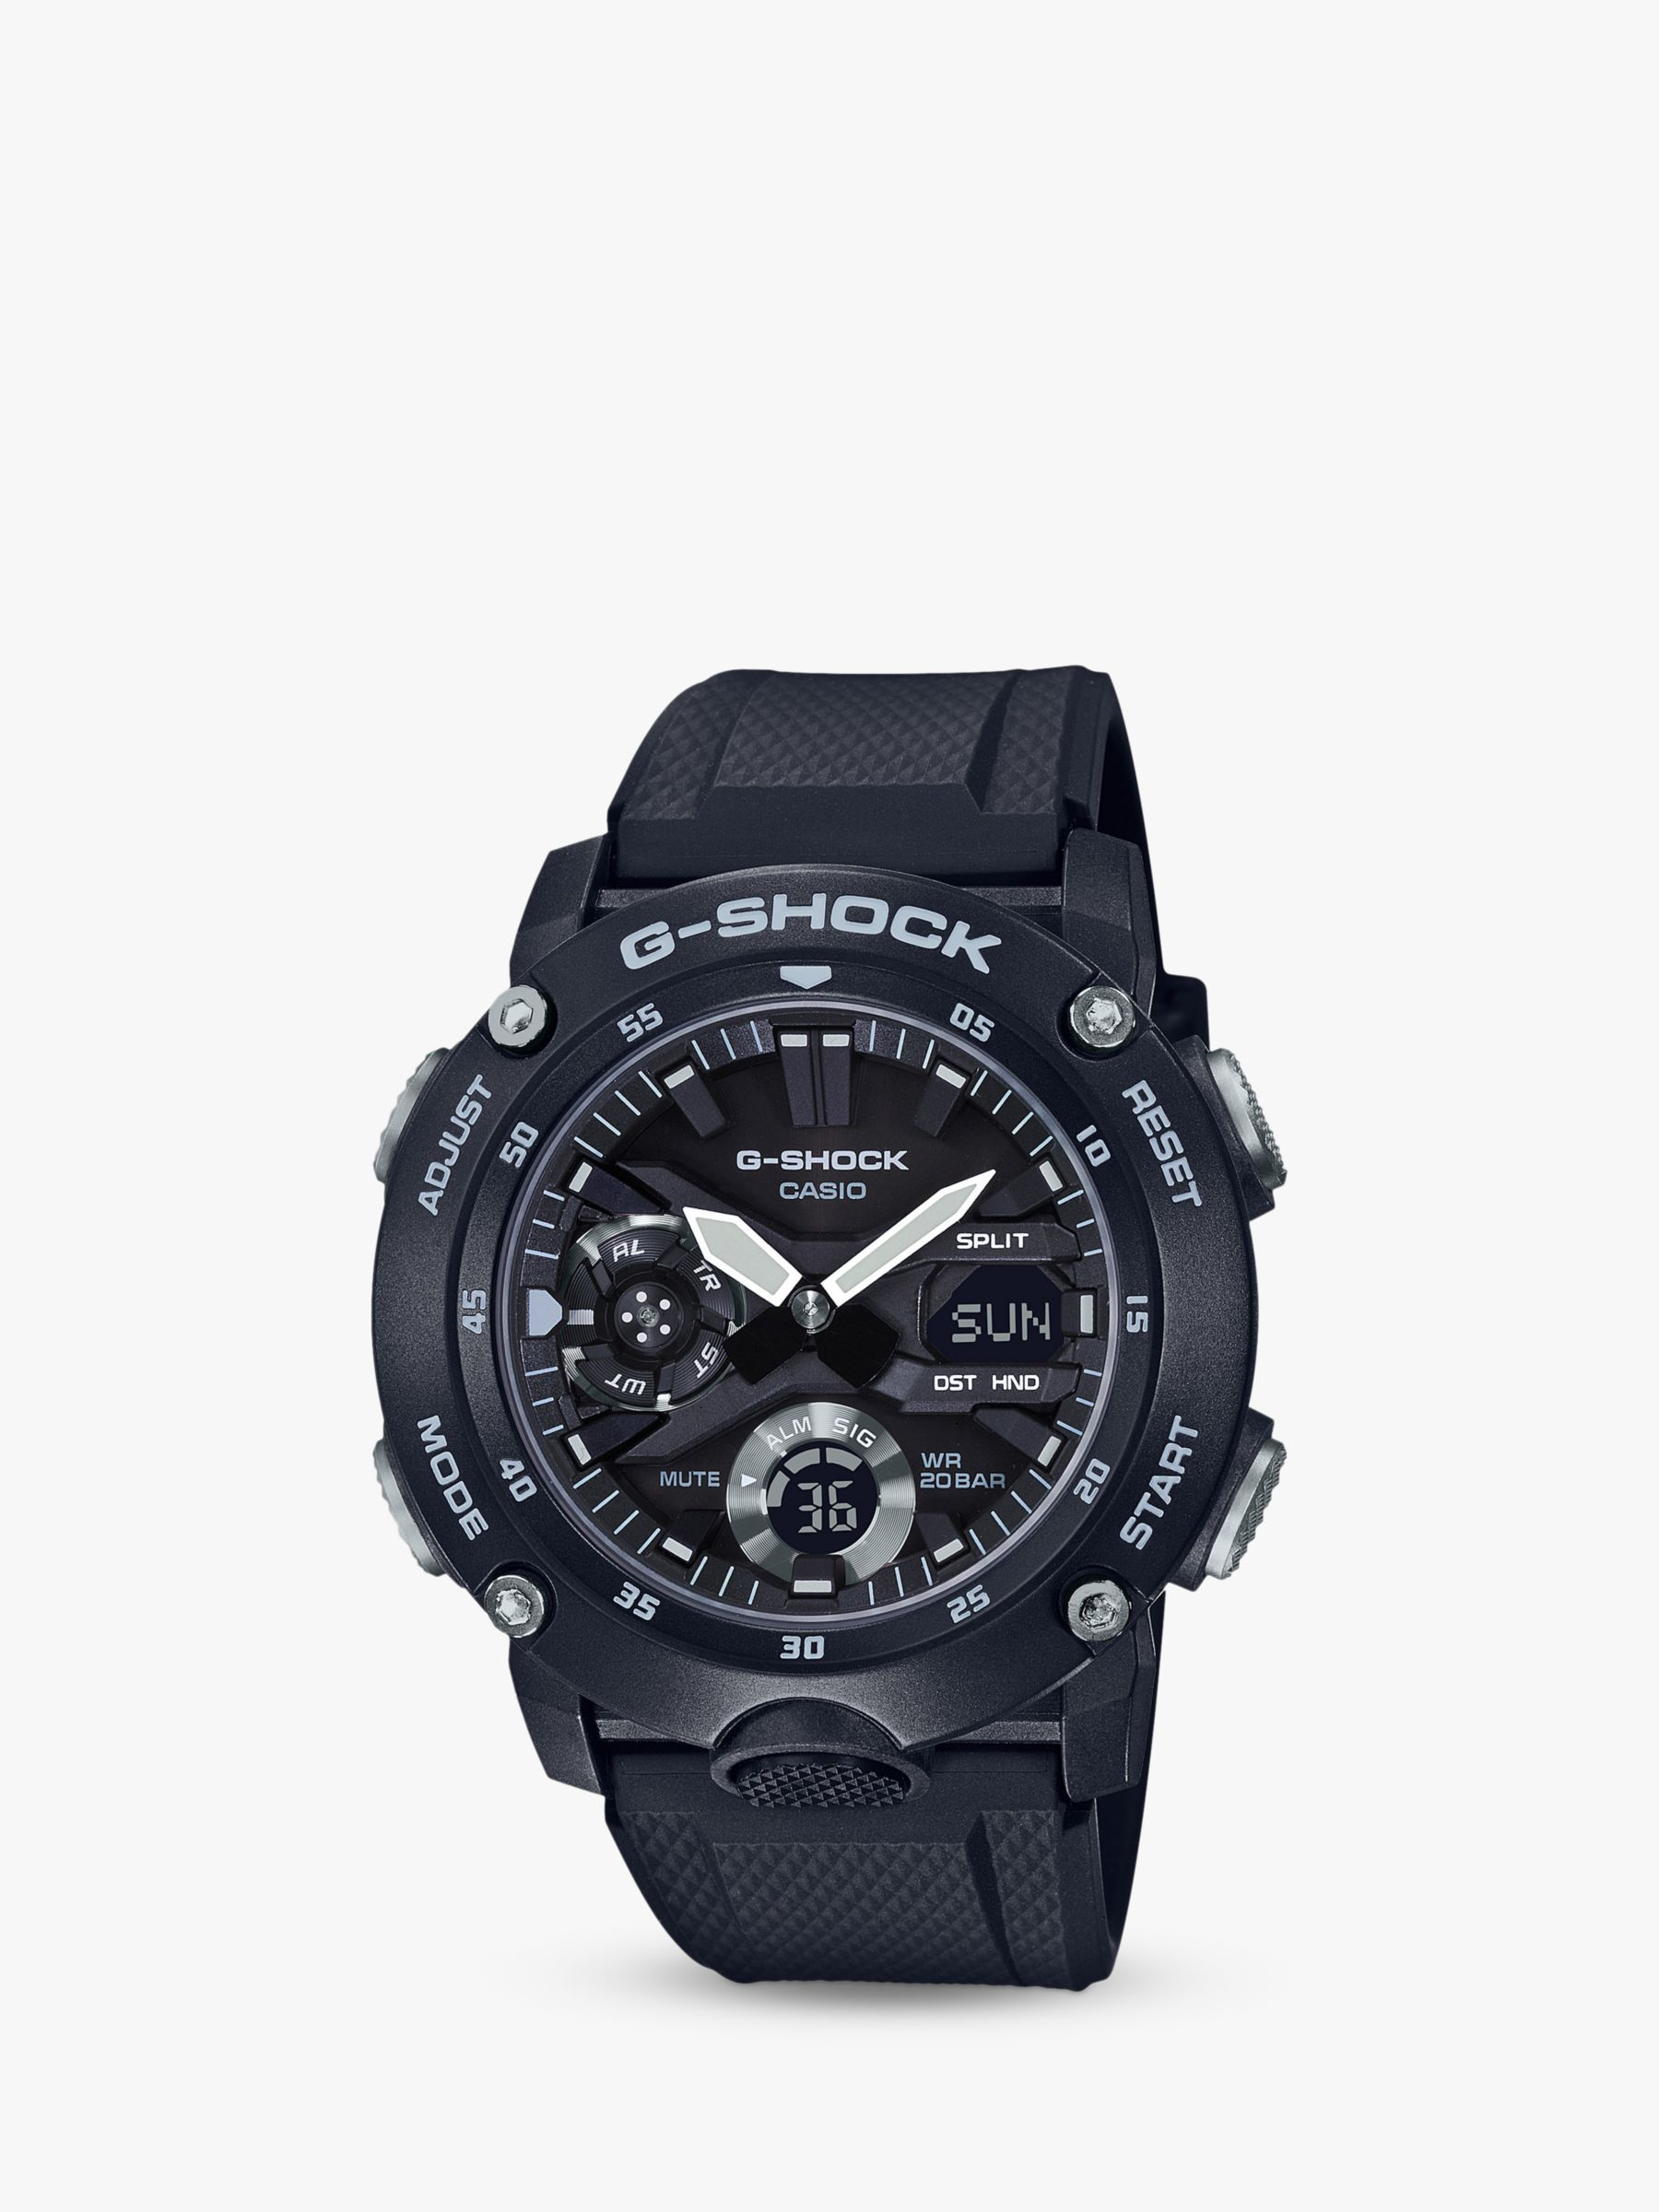 Casio Casio GA-2000S-1AER Men's G-Shock Chronograph Day Resin Strap Watch, Black